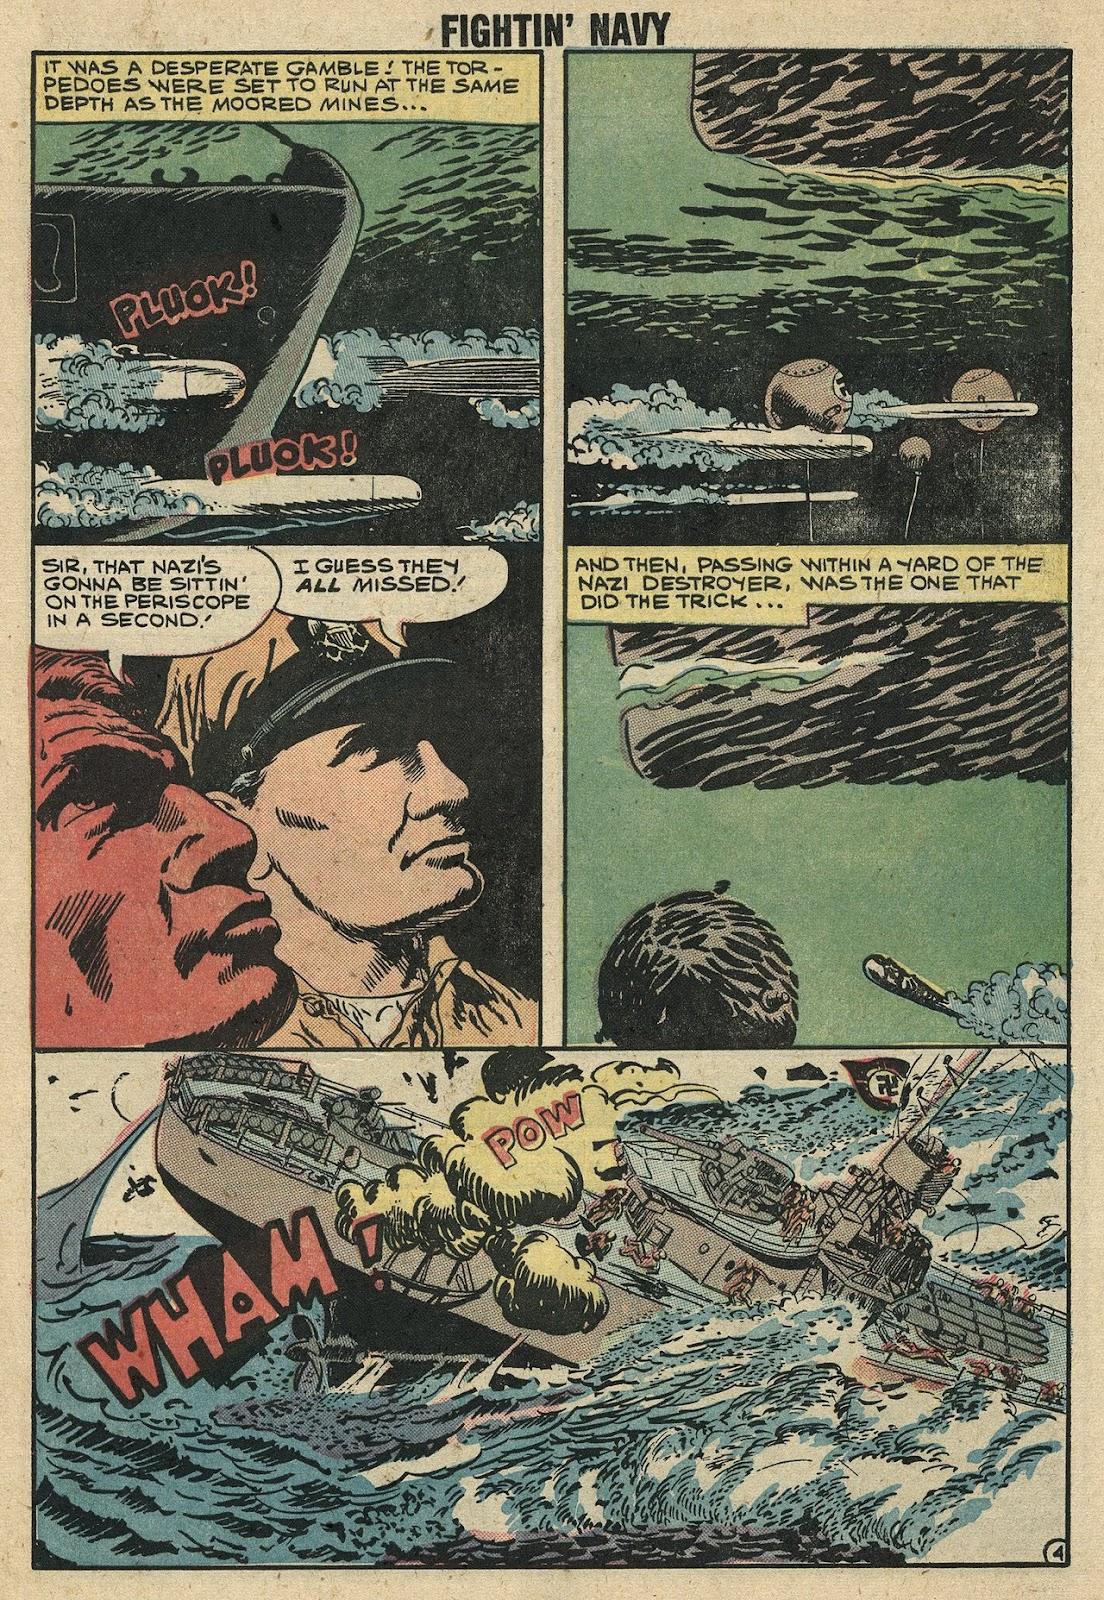 Read online Fightin' Navy comic -  Issue #86 - 7